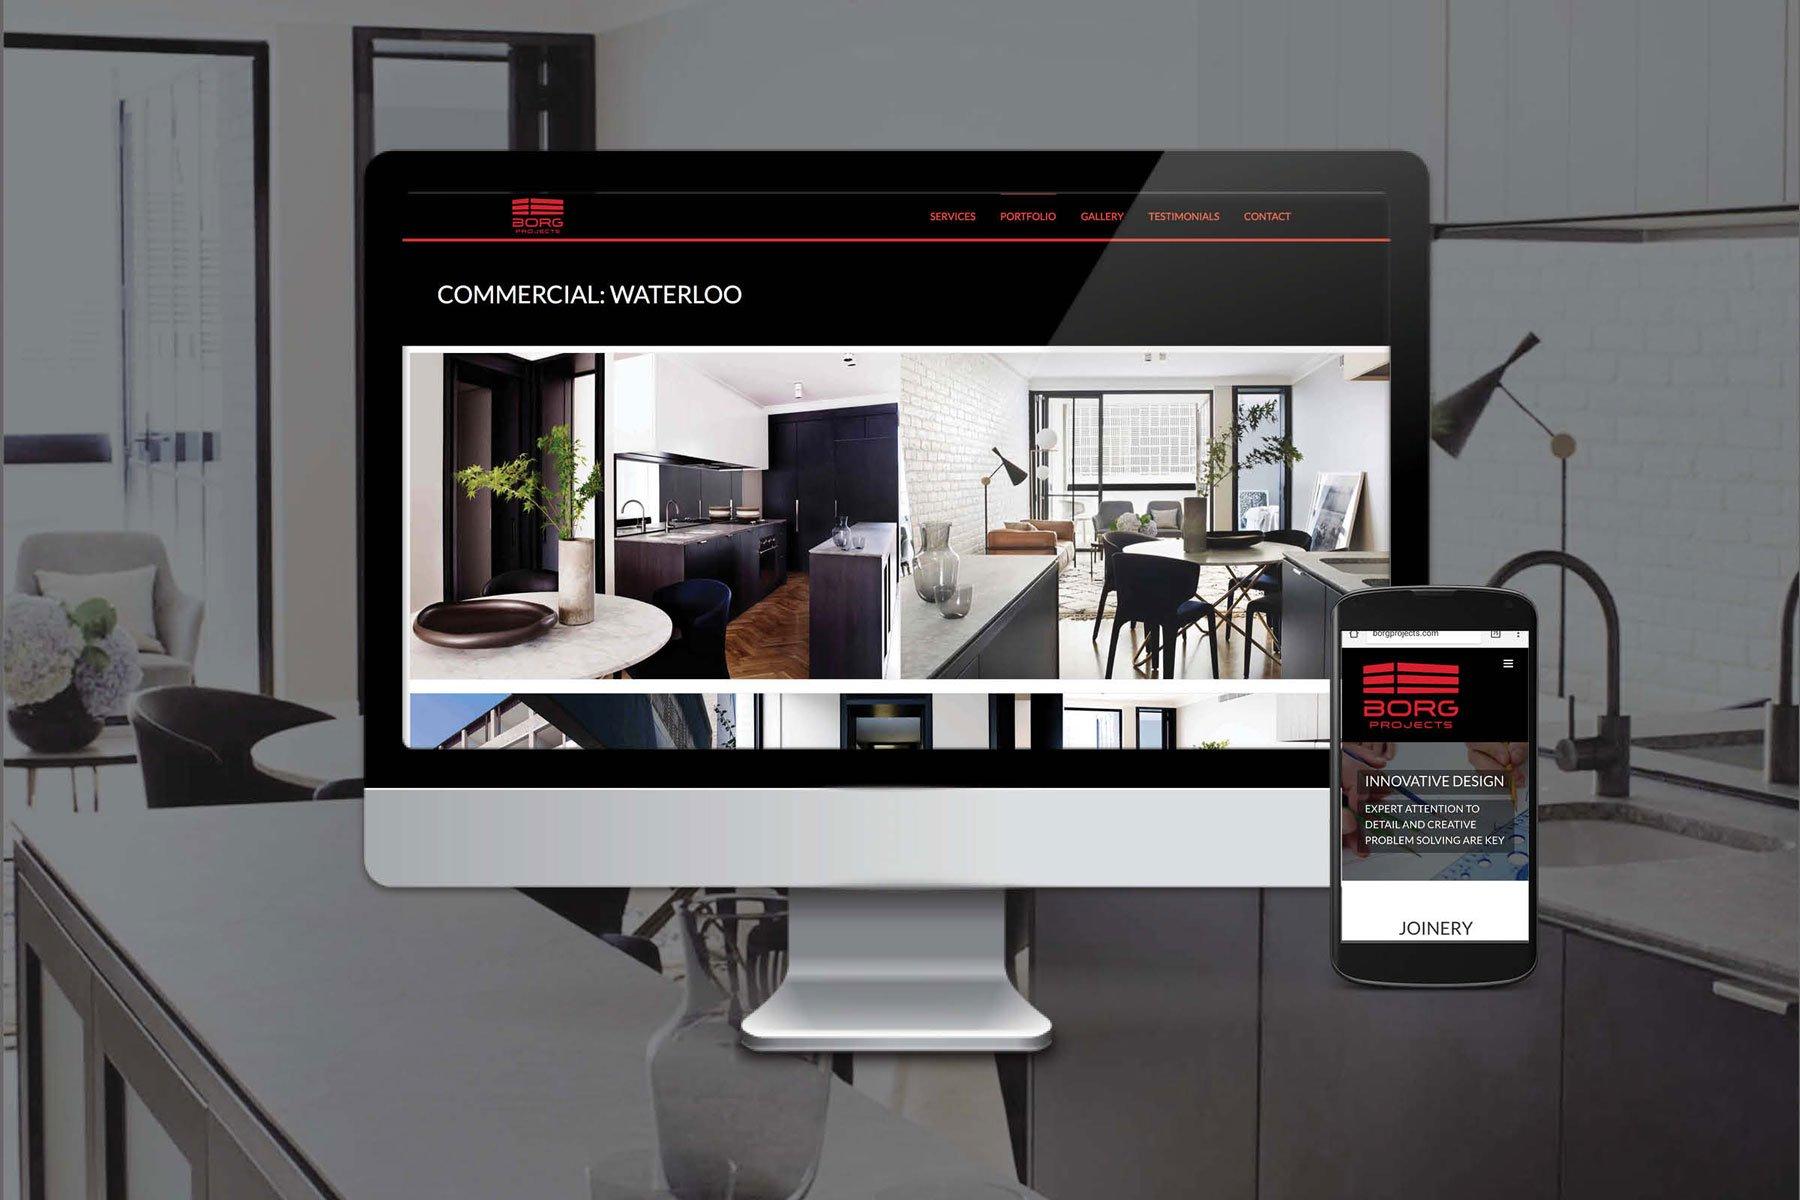 Yik Yak Creative | SEO | SEO Images | | SEO Images | SEO Keywords | Website Update | Website Refresh | Hills District Web Designer | Web Design Sydney | Search Engine Optimisation | Google | Marketing | Kellyville | Small Business Web Design Packages